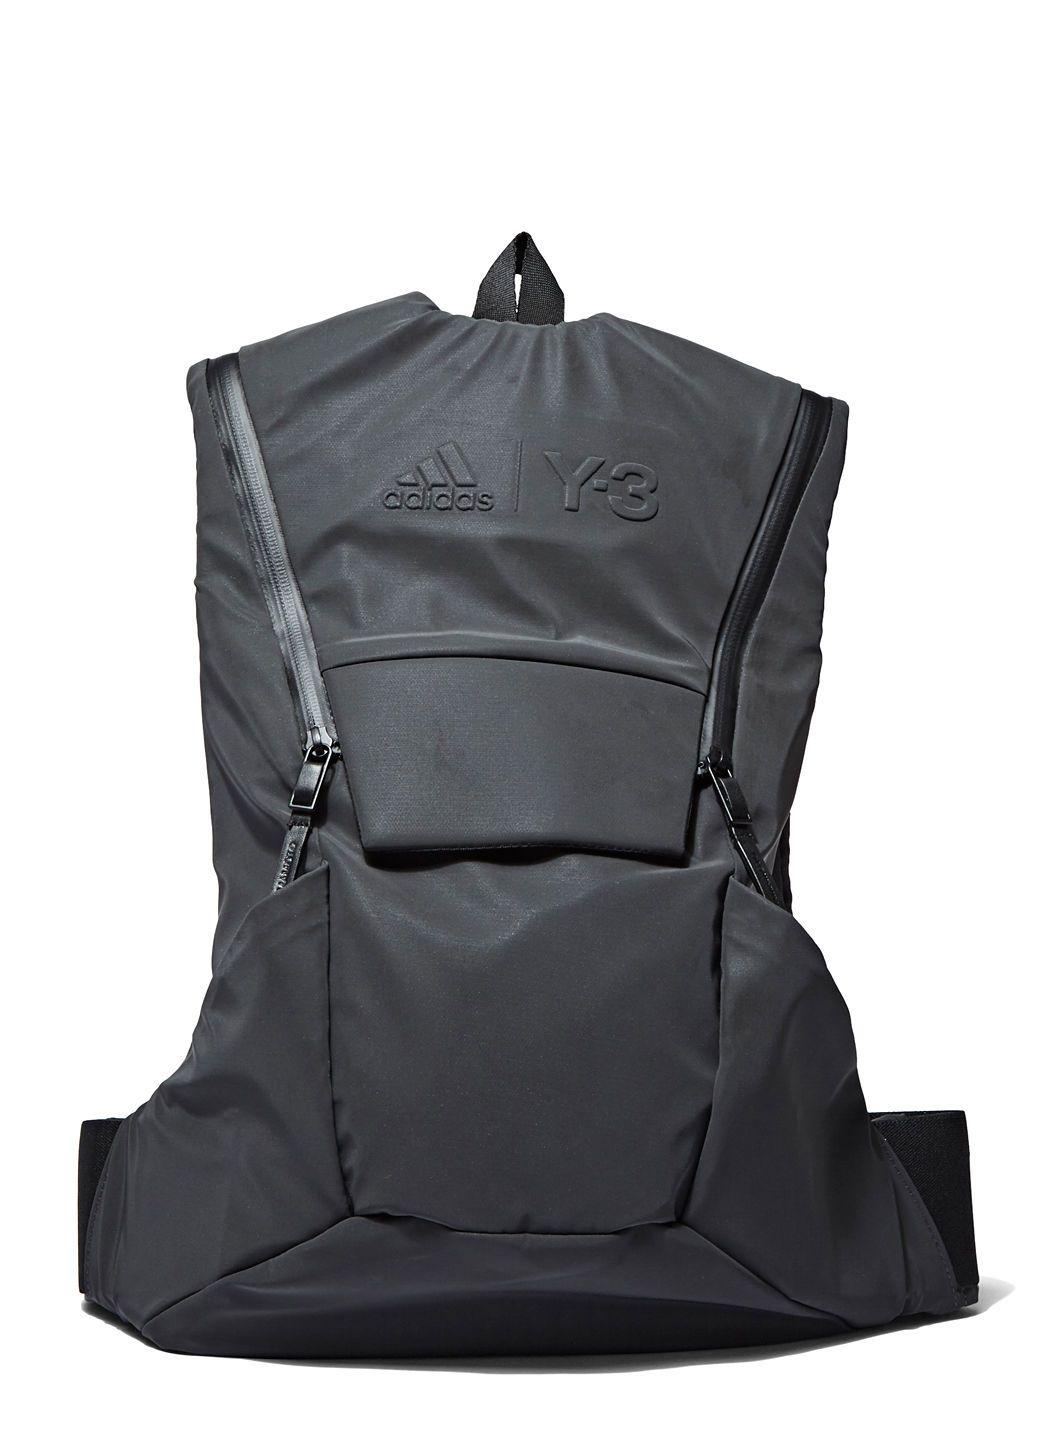 6087139a797b Y-3 SPORT Unisex Running Backpack In Grey.  y-3sport  bags  polyester   backpacks